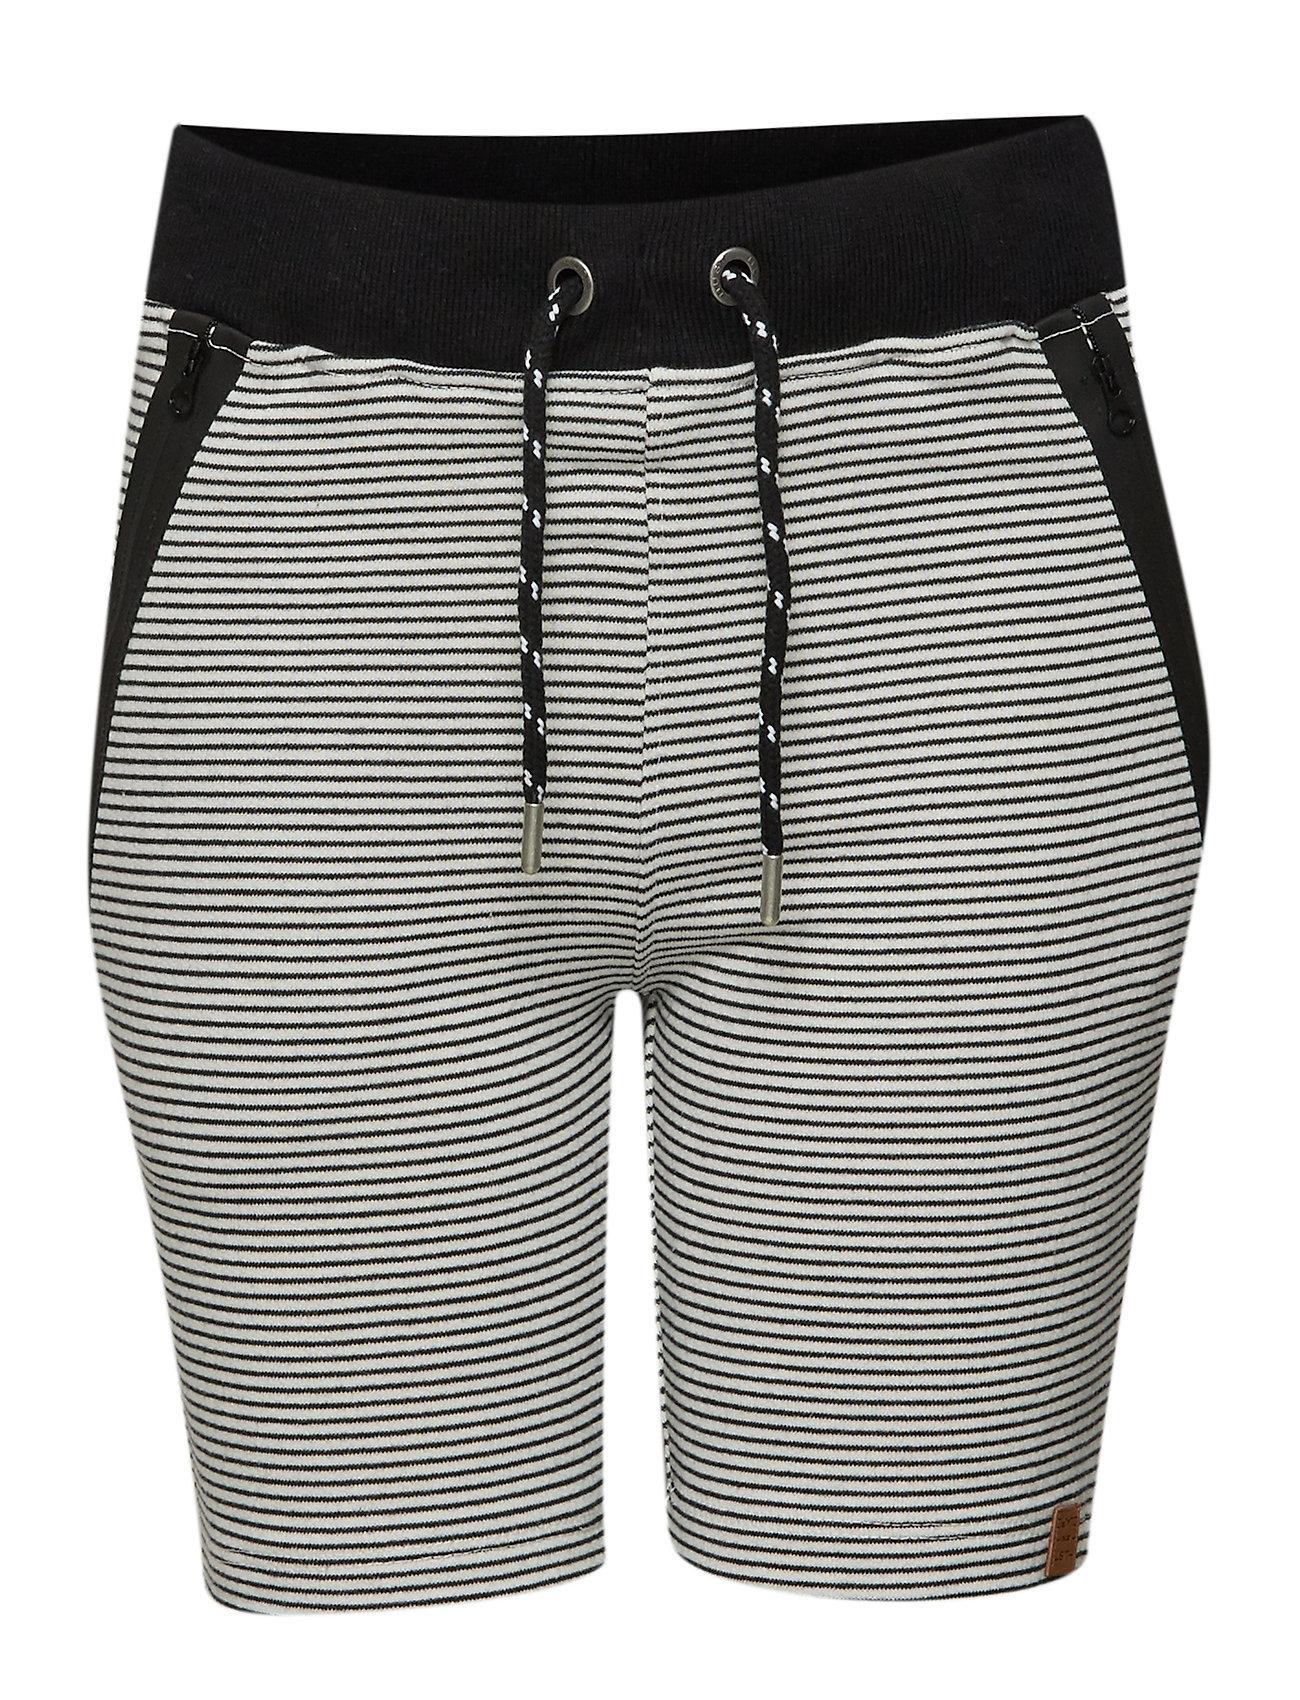 Hust & Claire Hai - Shorts - BLACK